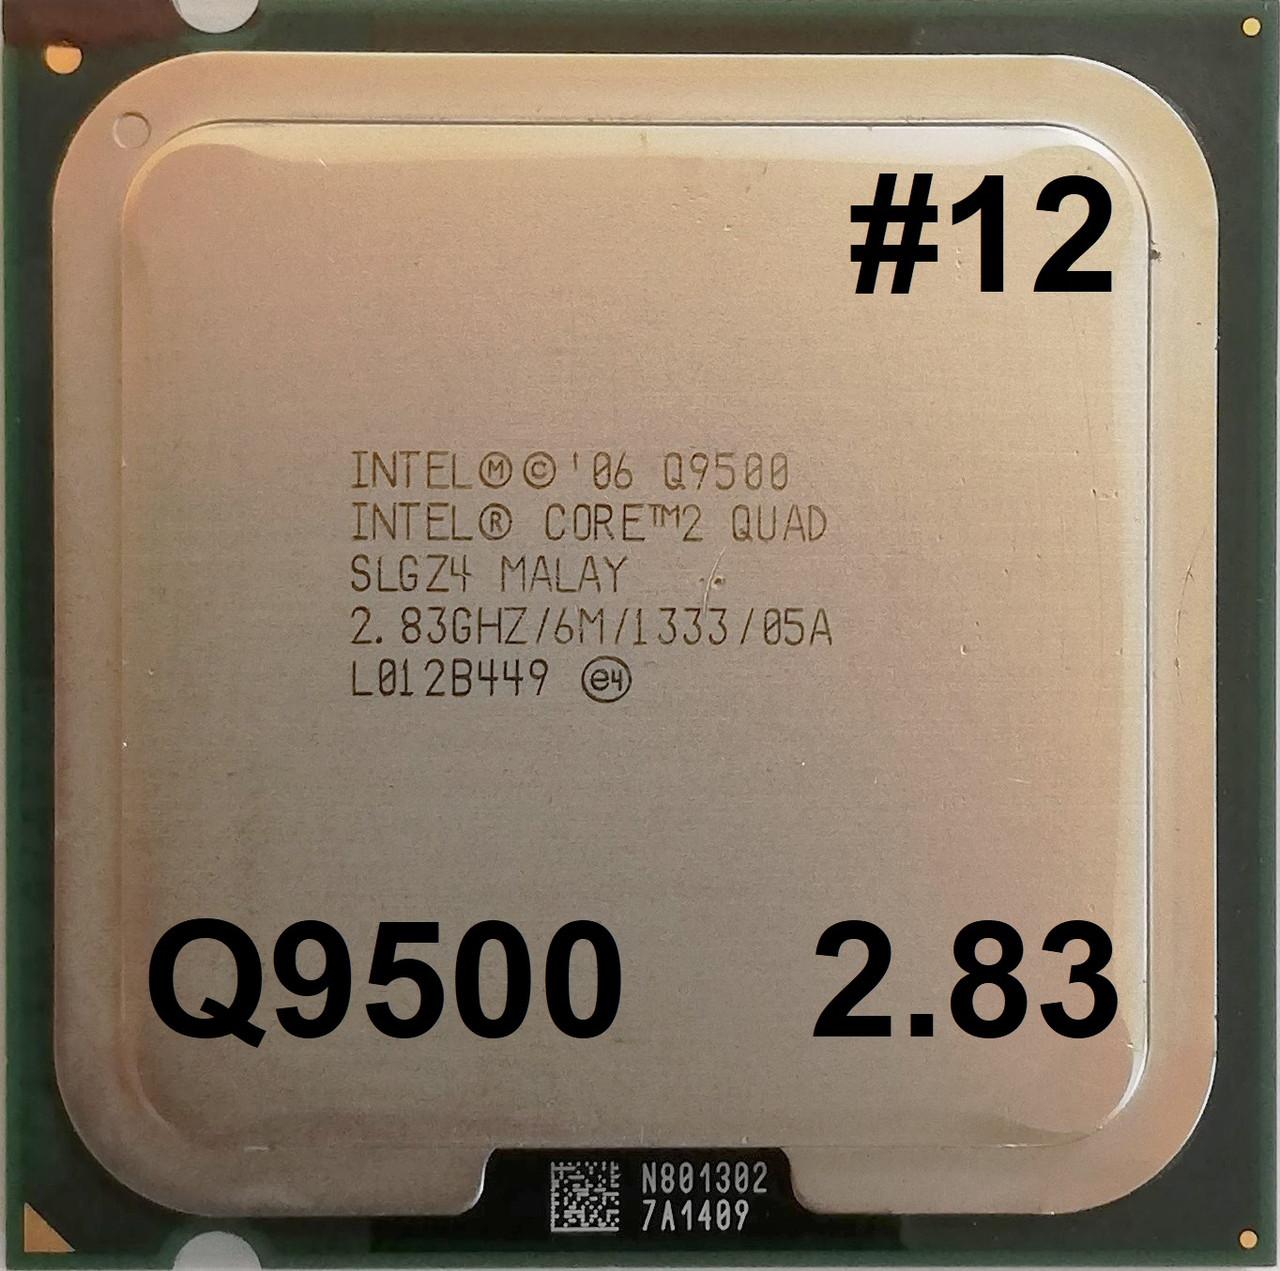 Процессор ЛОТ #12 Intel Core2 Quad Q9500 R0 SLGZ4 2.83GHz 6M Cache 1333 MHz FSB Soket 775 Б/У